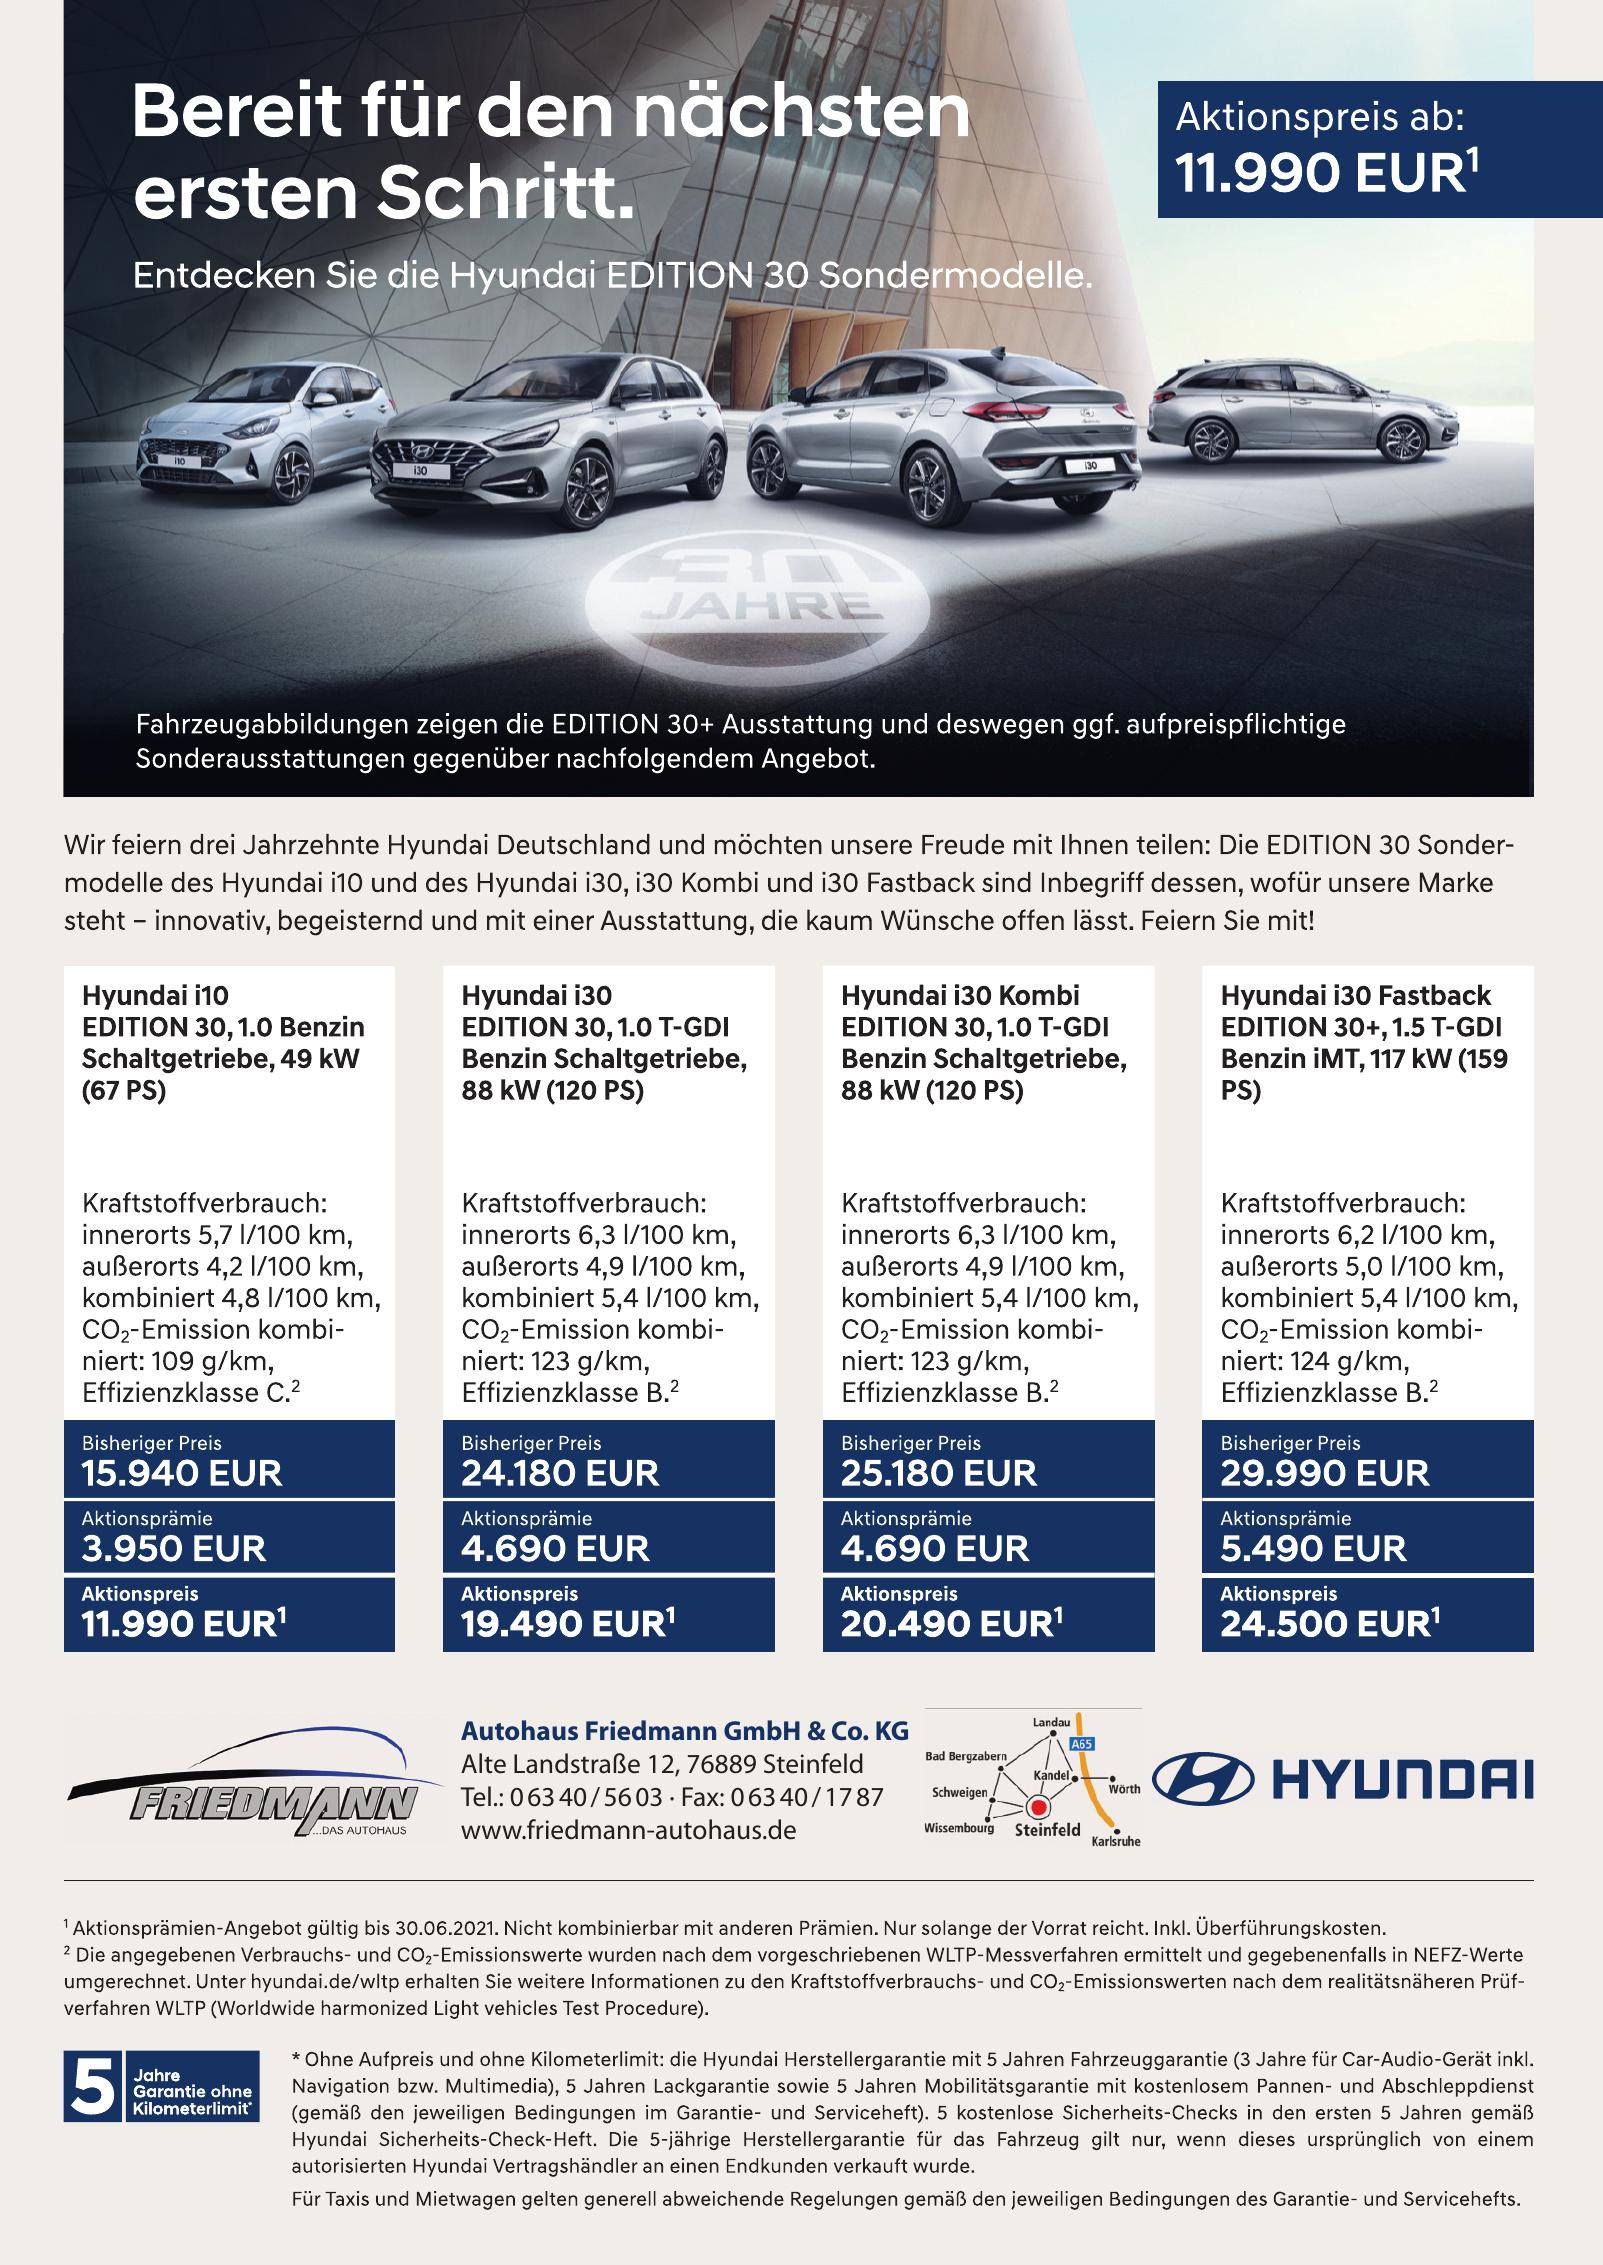 Autohaus Friedmann GmbH & Co. KG